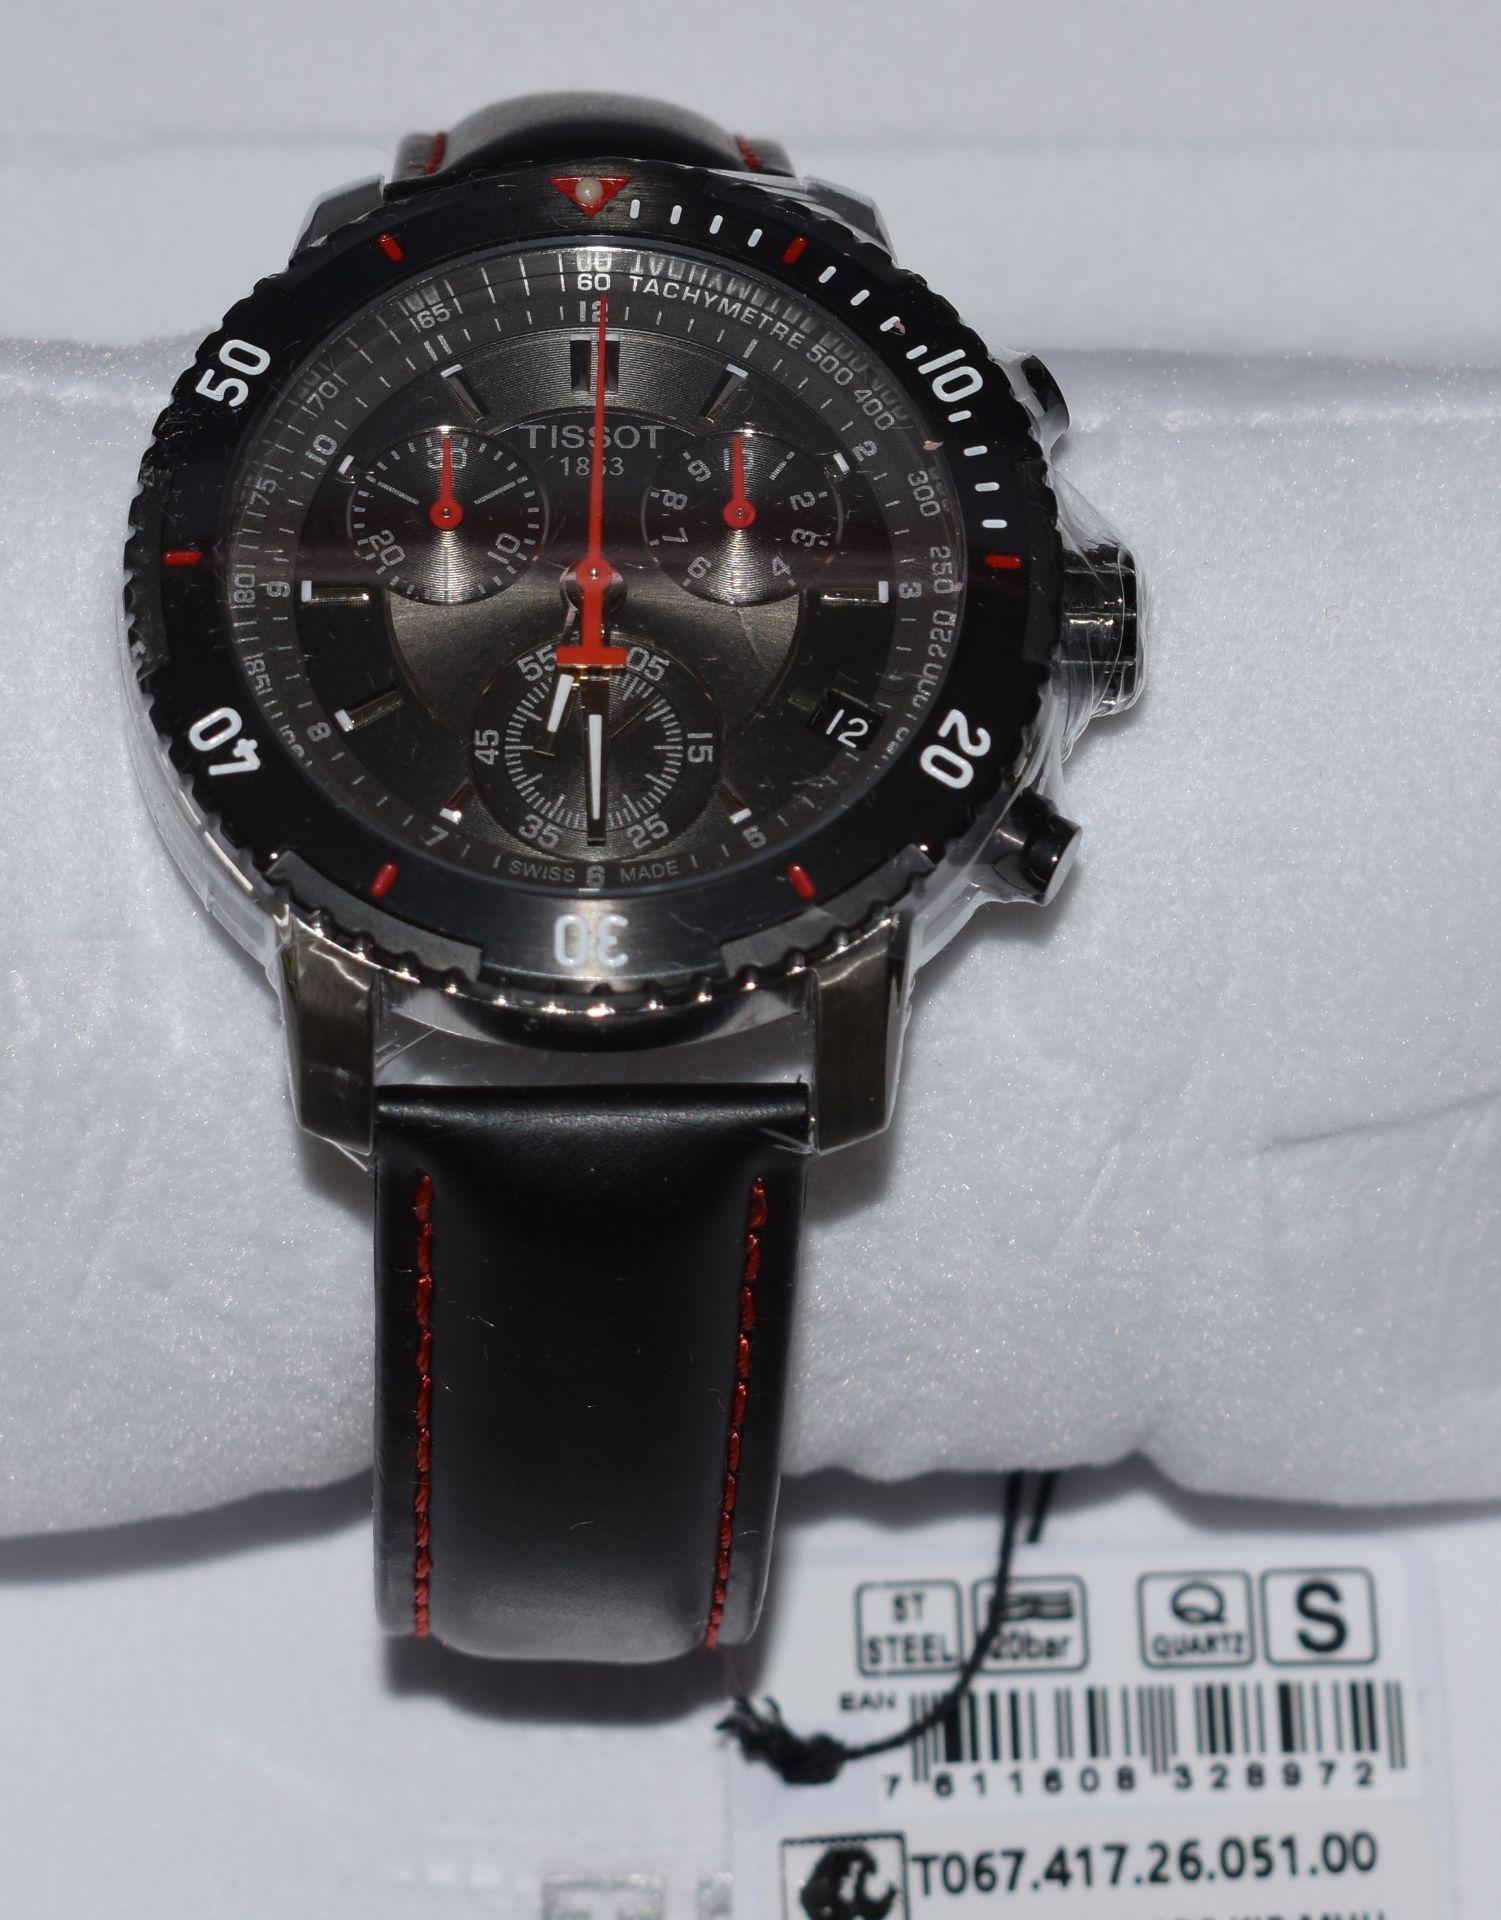 Tissot Men's watch TO67.417.26.051.00 - Image 2 of 3